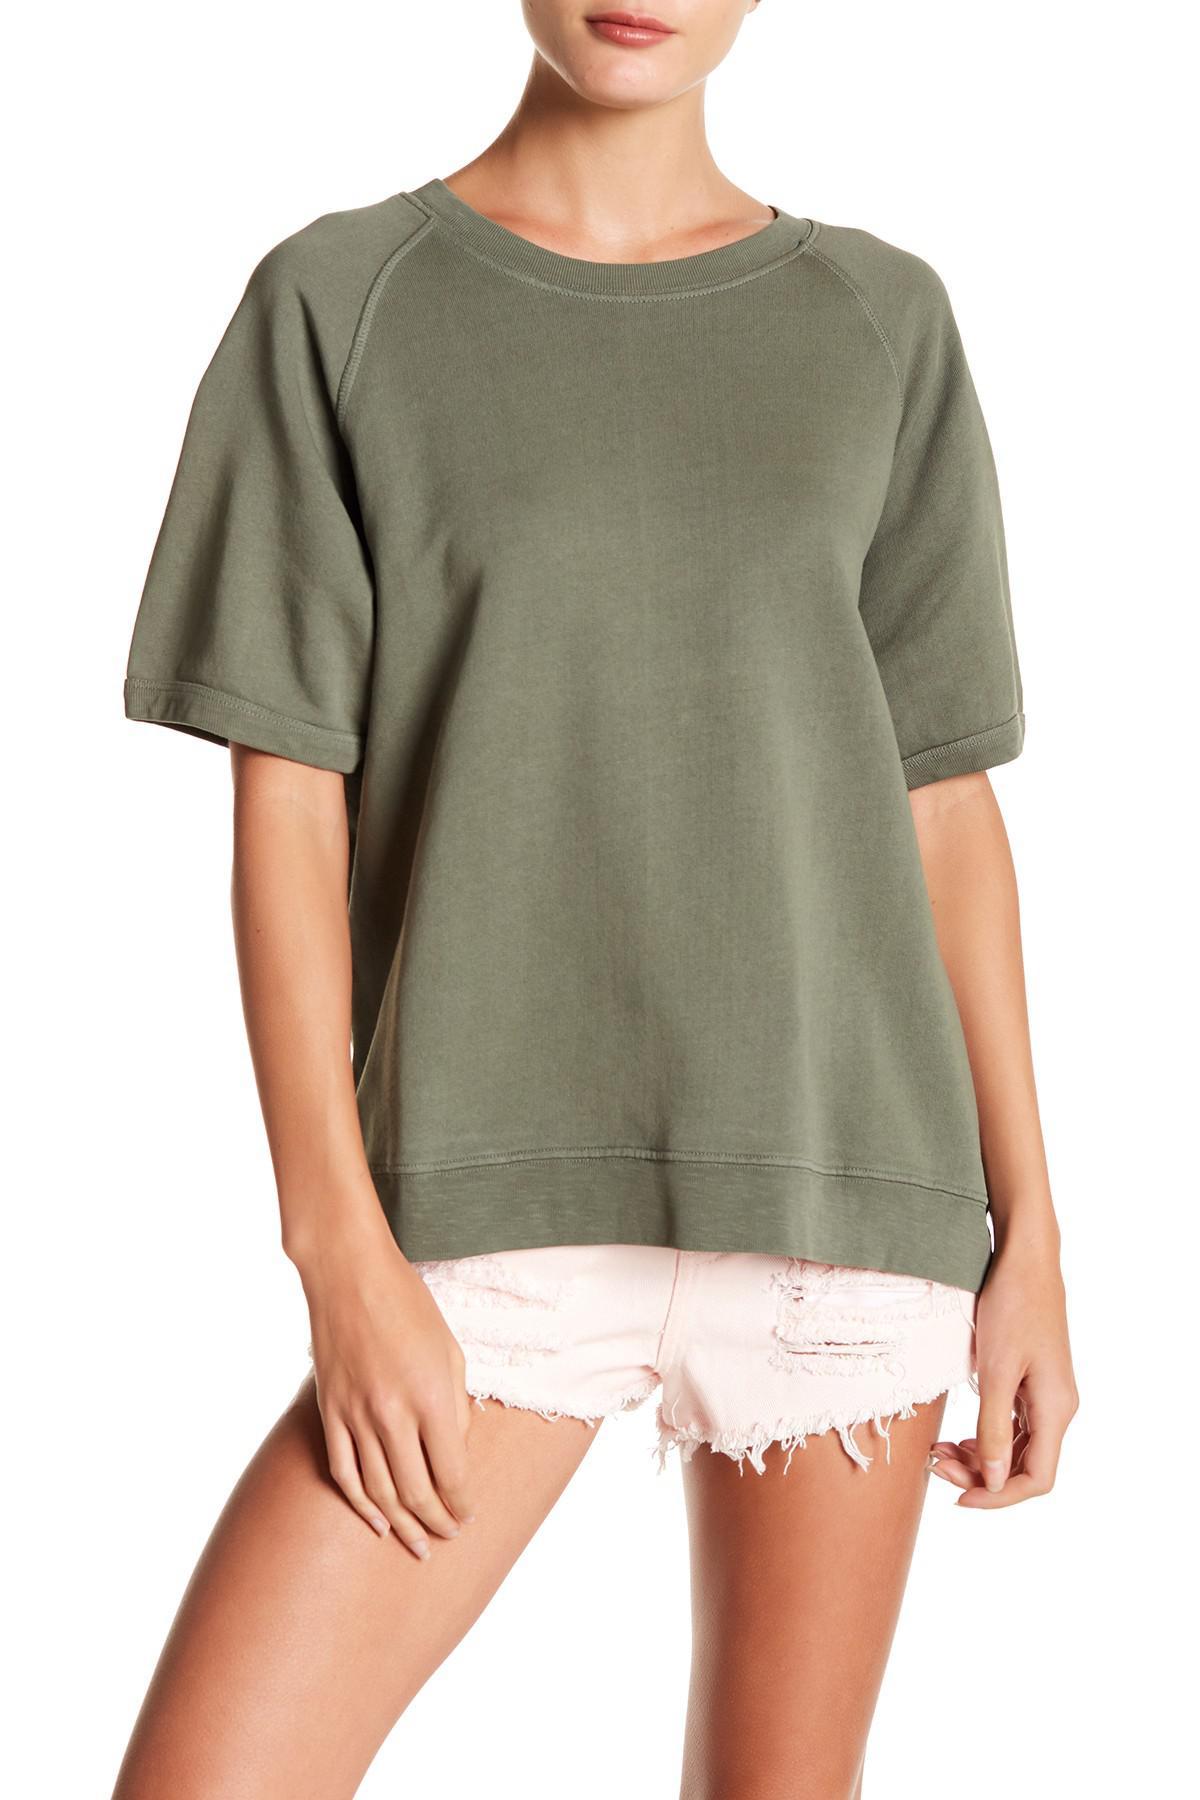 9f89ed79d55d8 Lyst - Sincerely Jules Cara Dolman Sleeve Sweatshirt in Green